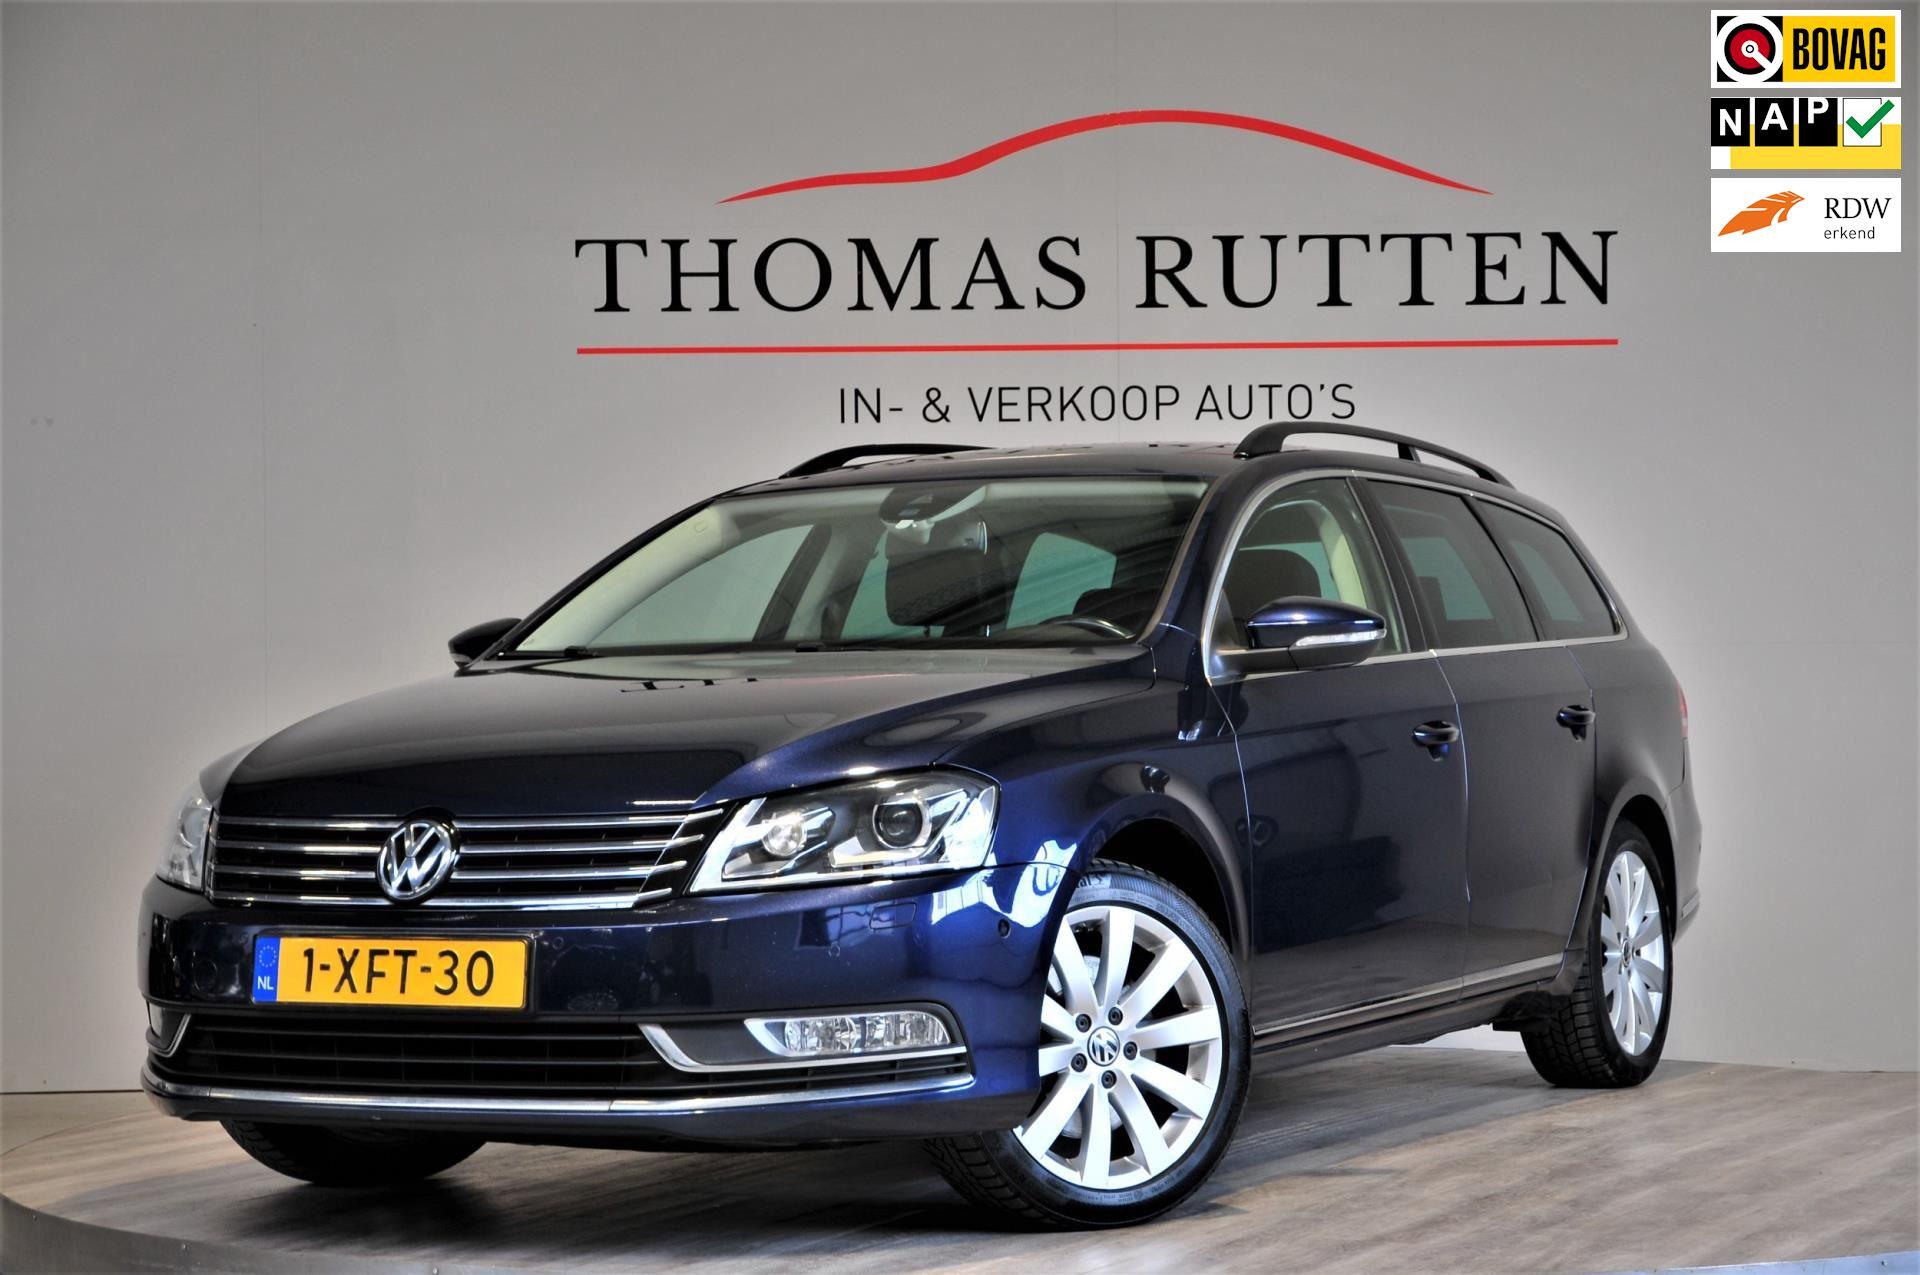 Volkswagen Passat Variant occasion - Autobedrijf Thomas Rutten